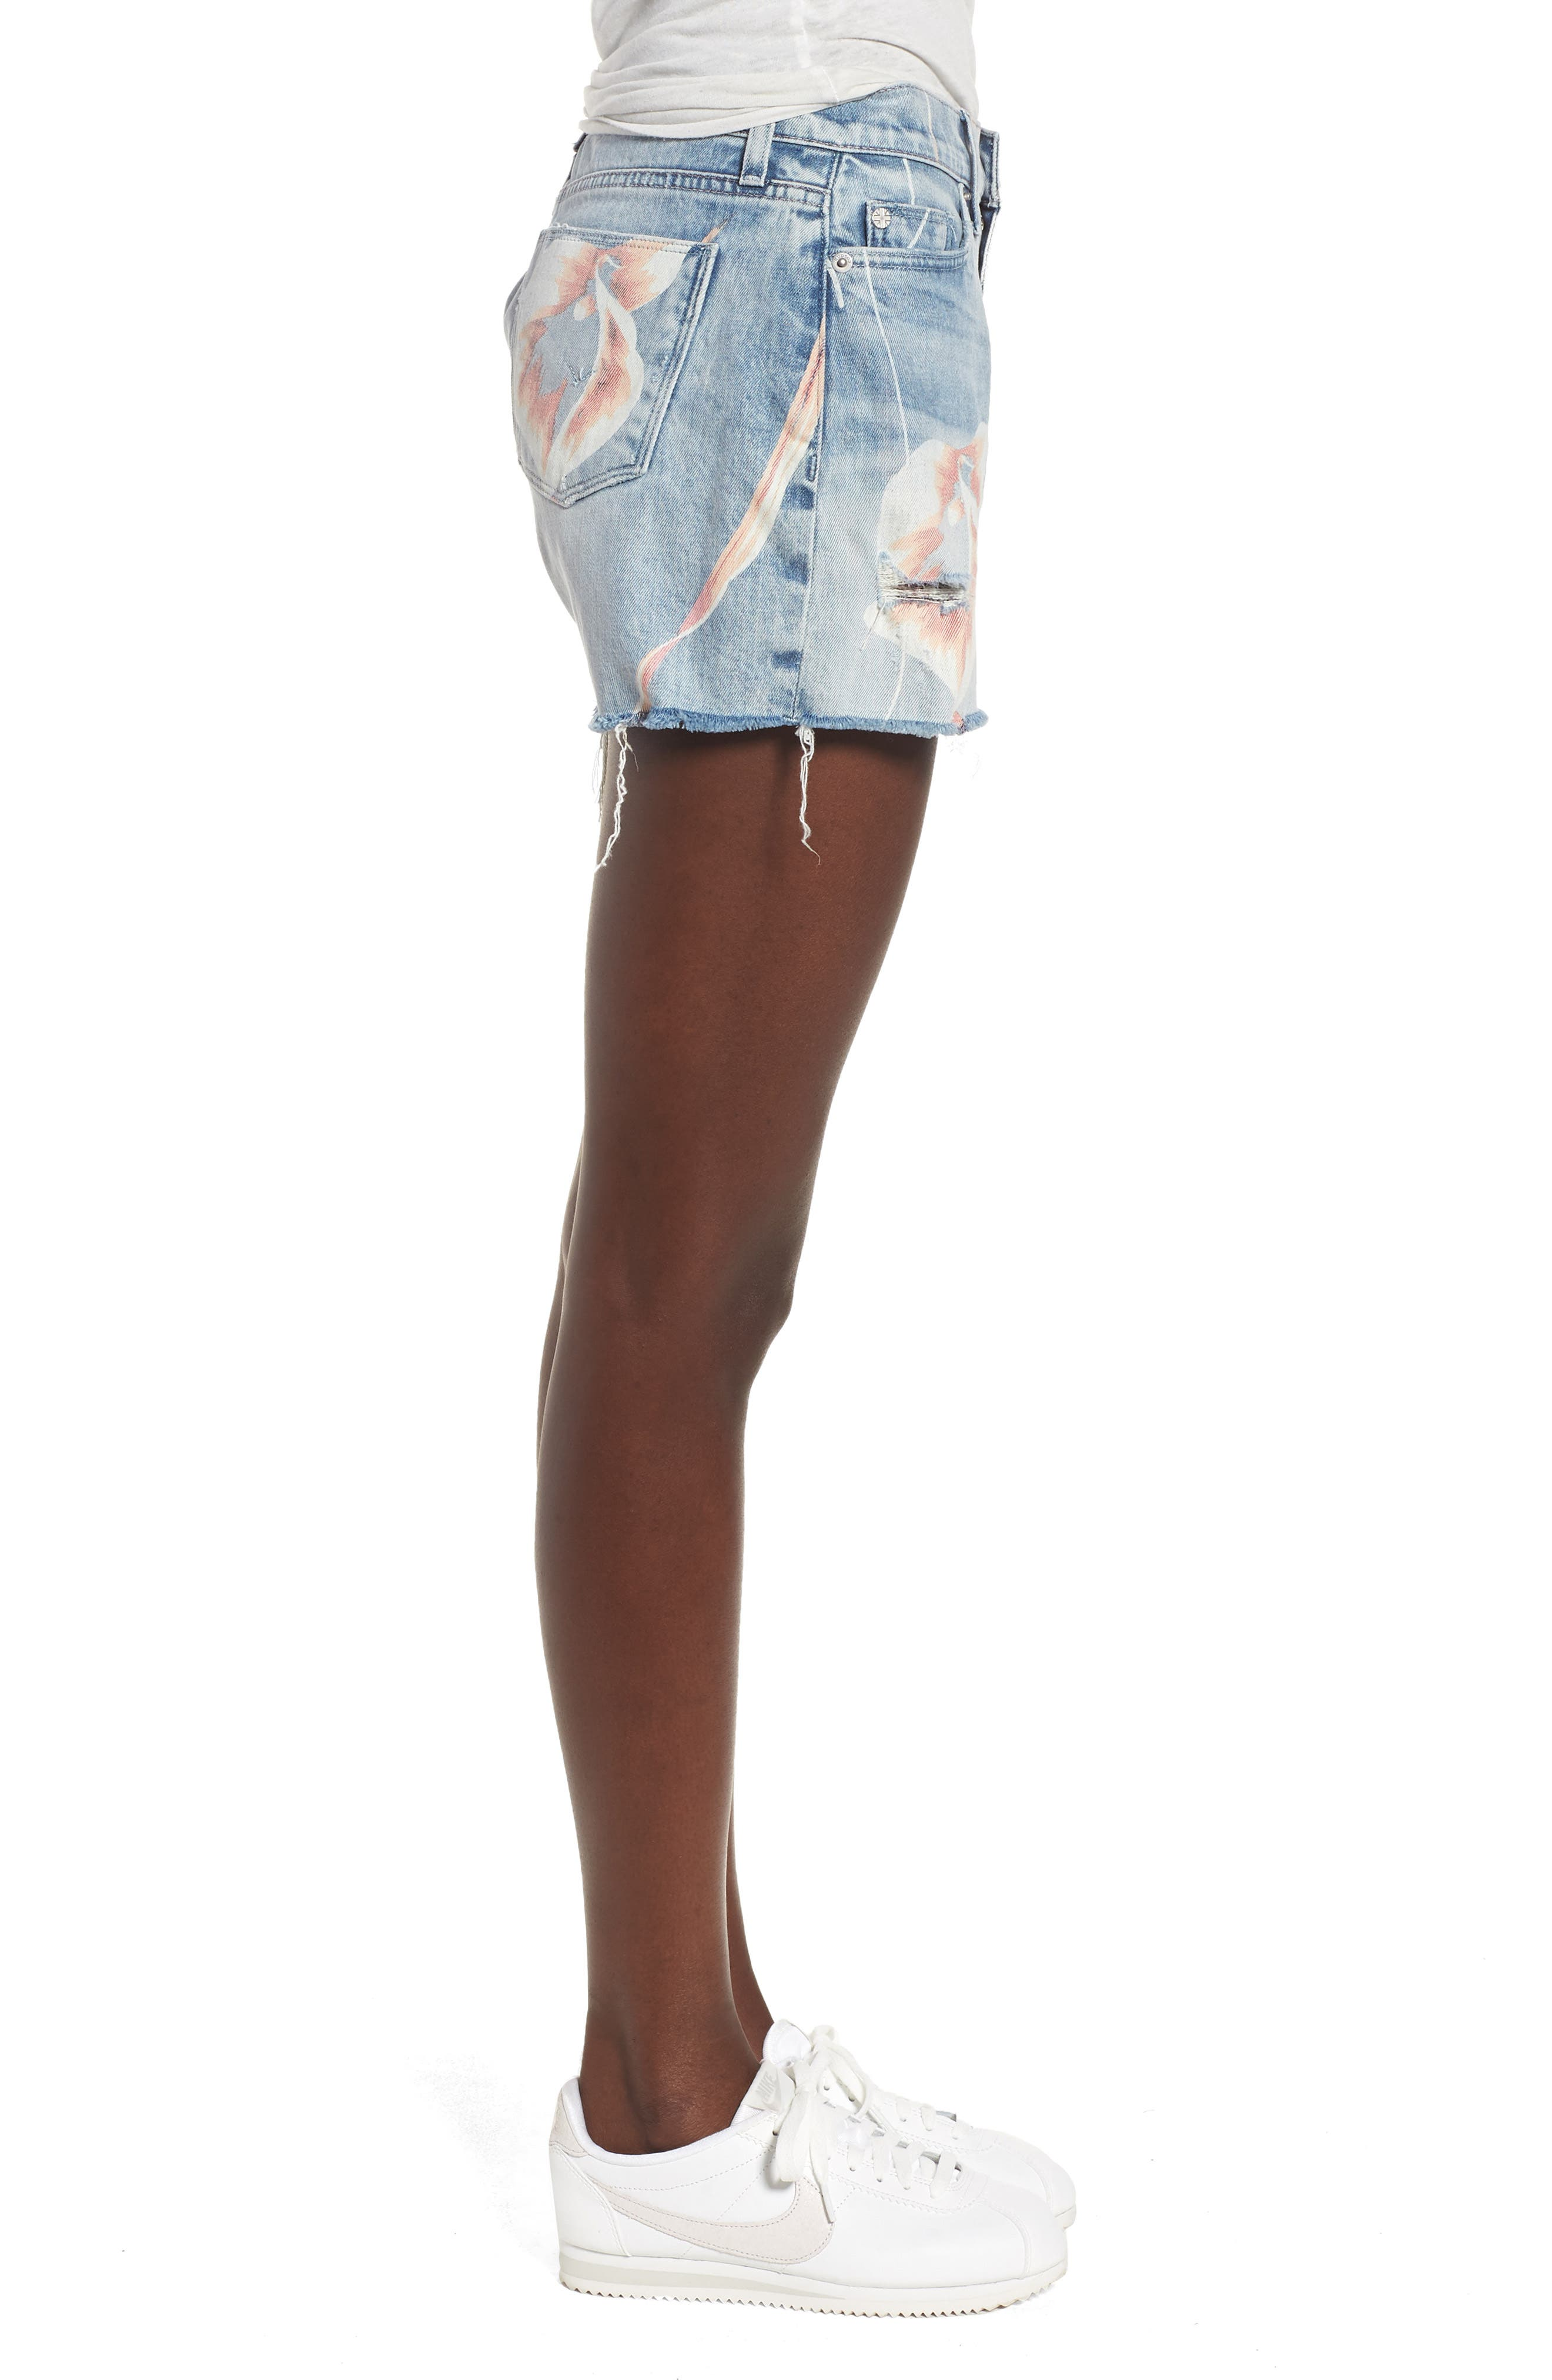 Valeri Painted Denim Shorts,                             Alternate thumbnail 3, color,                             001